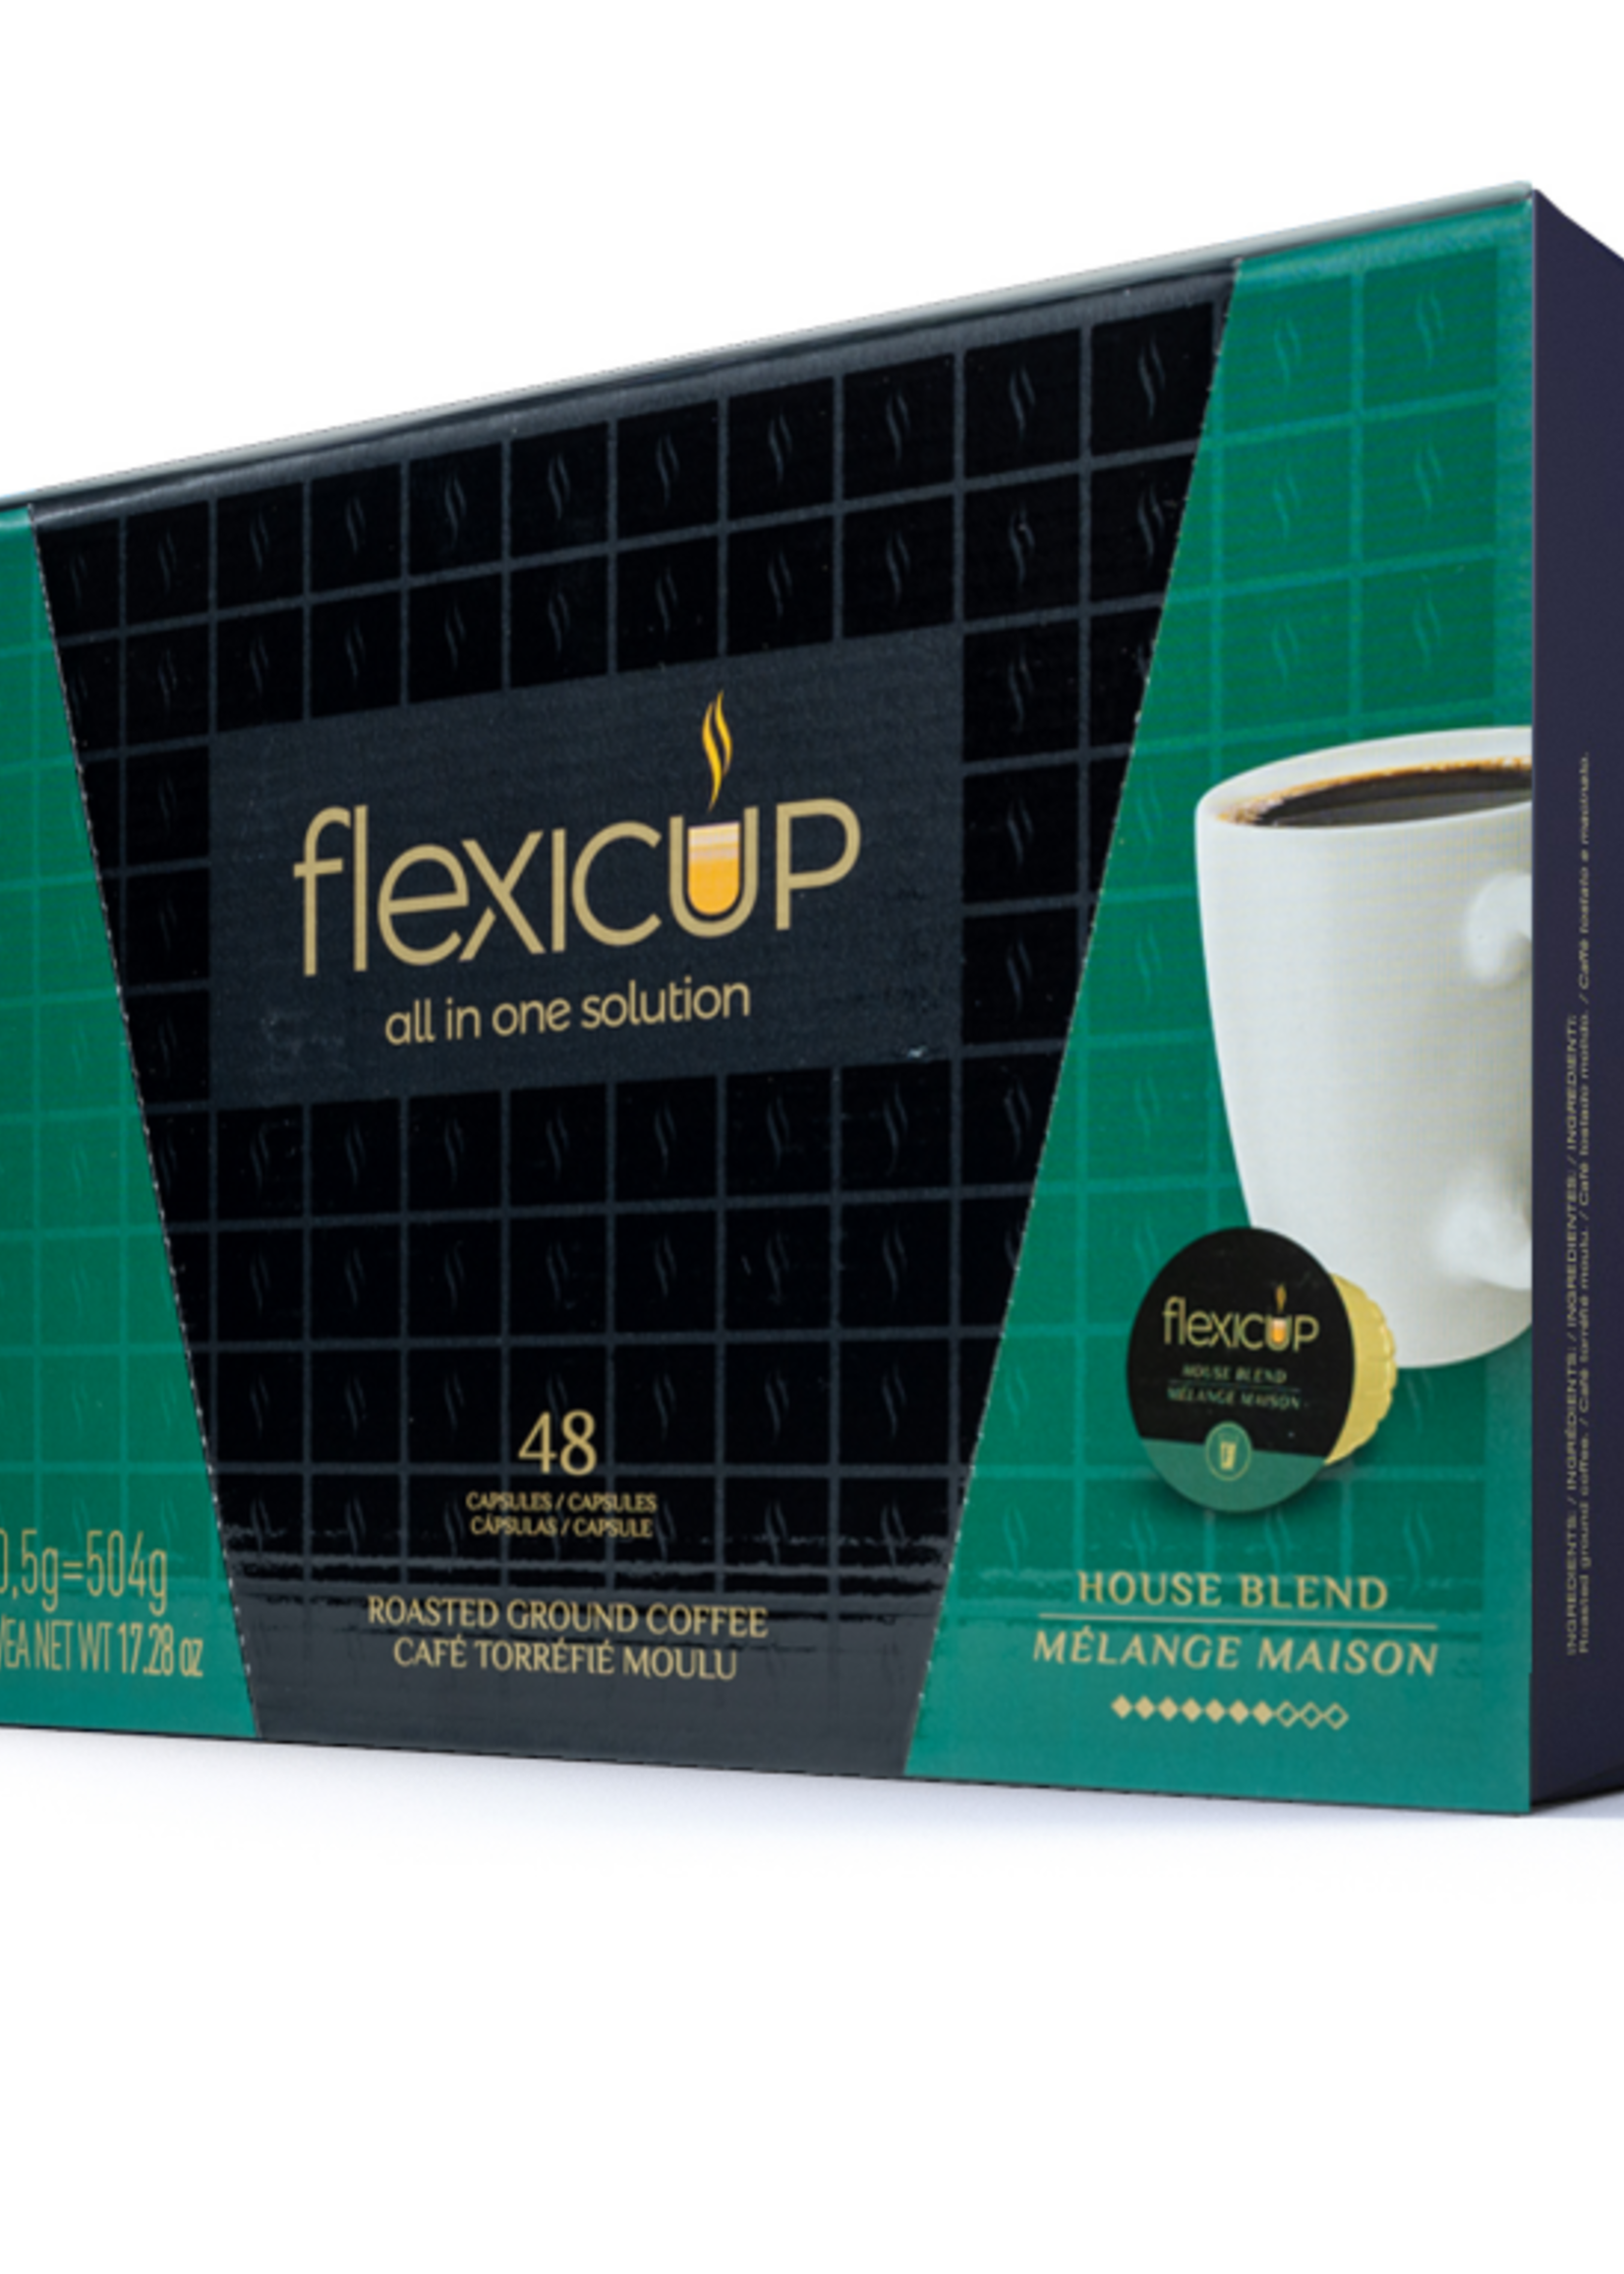 flexicup flexicup House Blend (48)